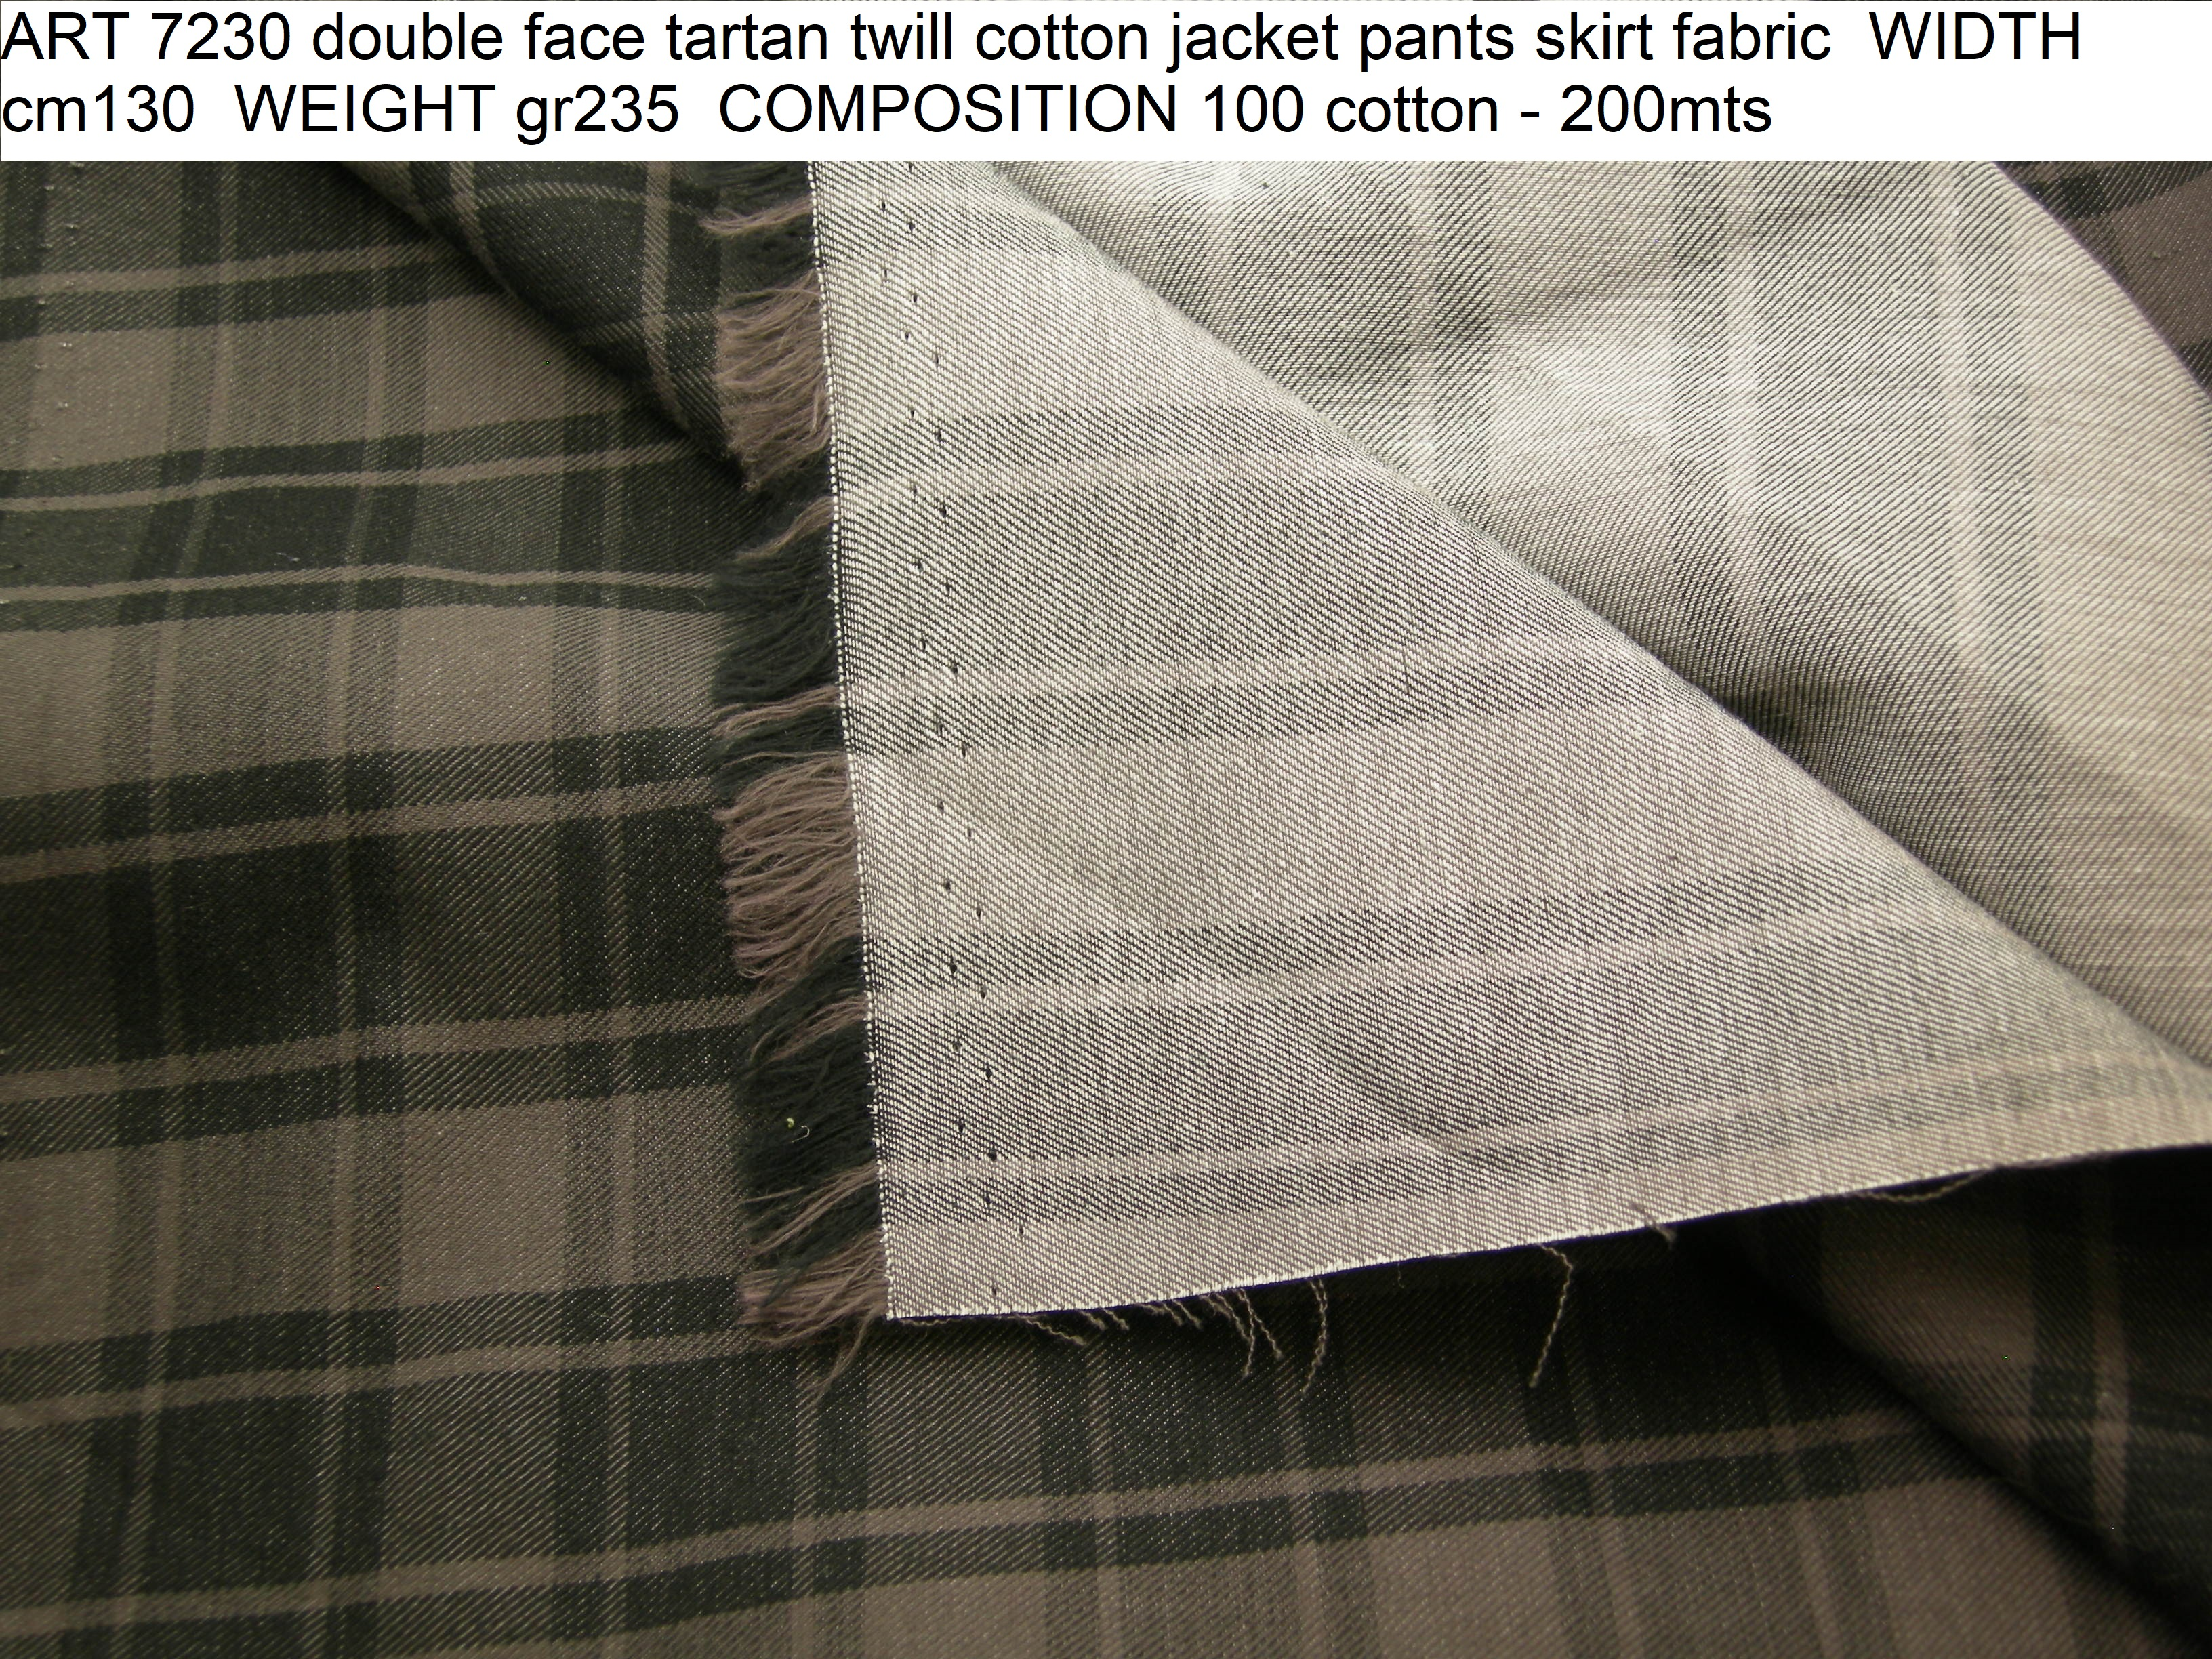 ART 7230 double face tartan twill cotton jacket pants skirt fabric WIDTH cm130 WEIGHT gr235 COMPOSITION 100 cotton - 200mts